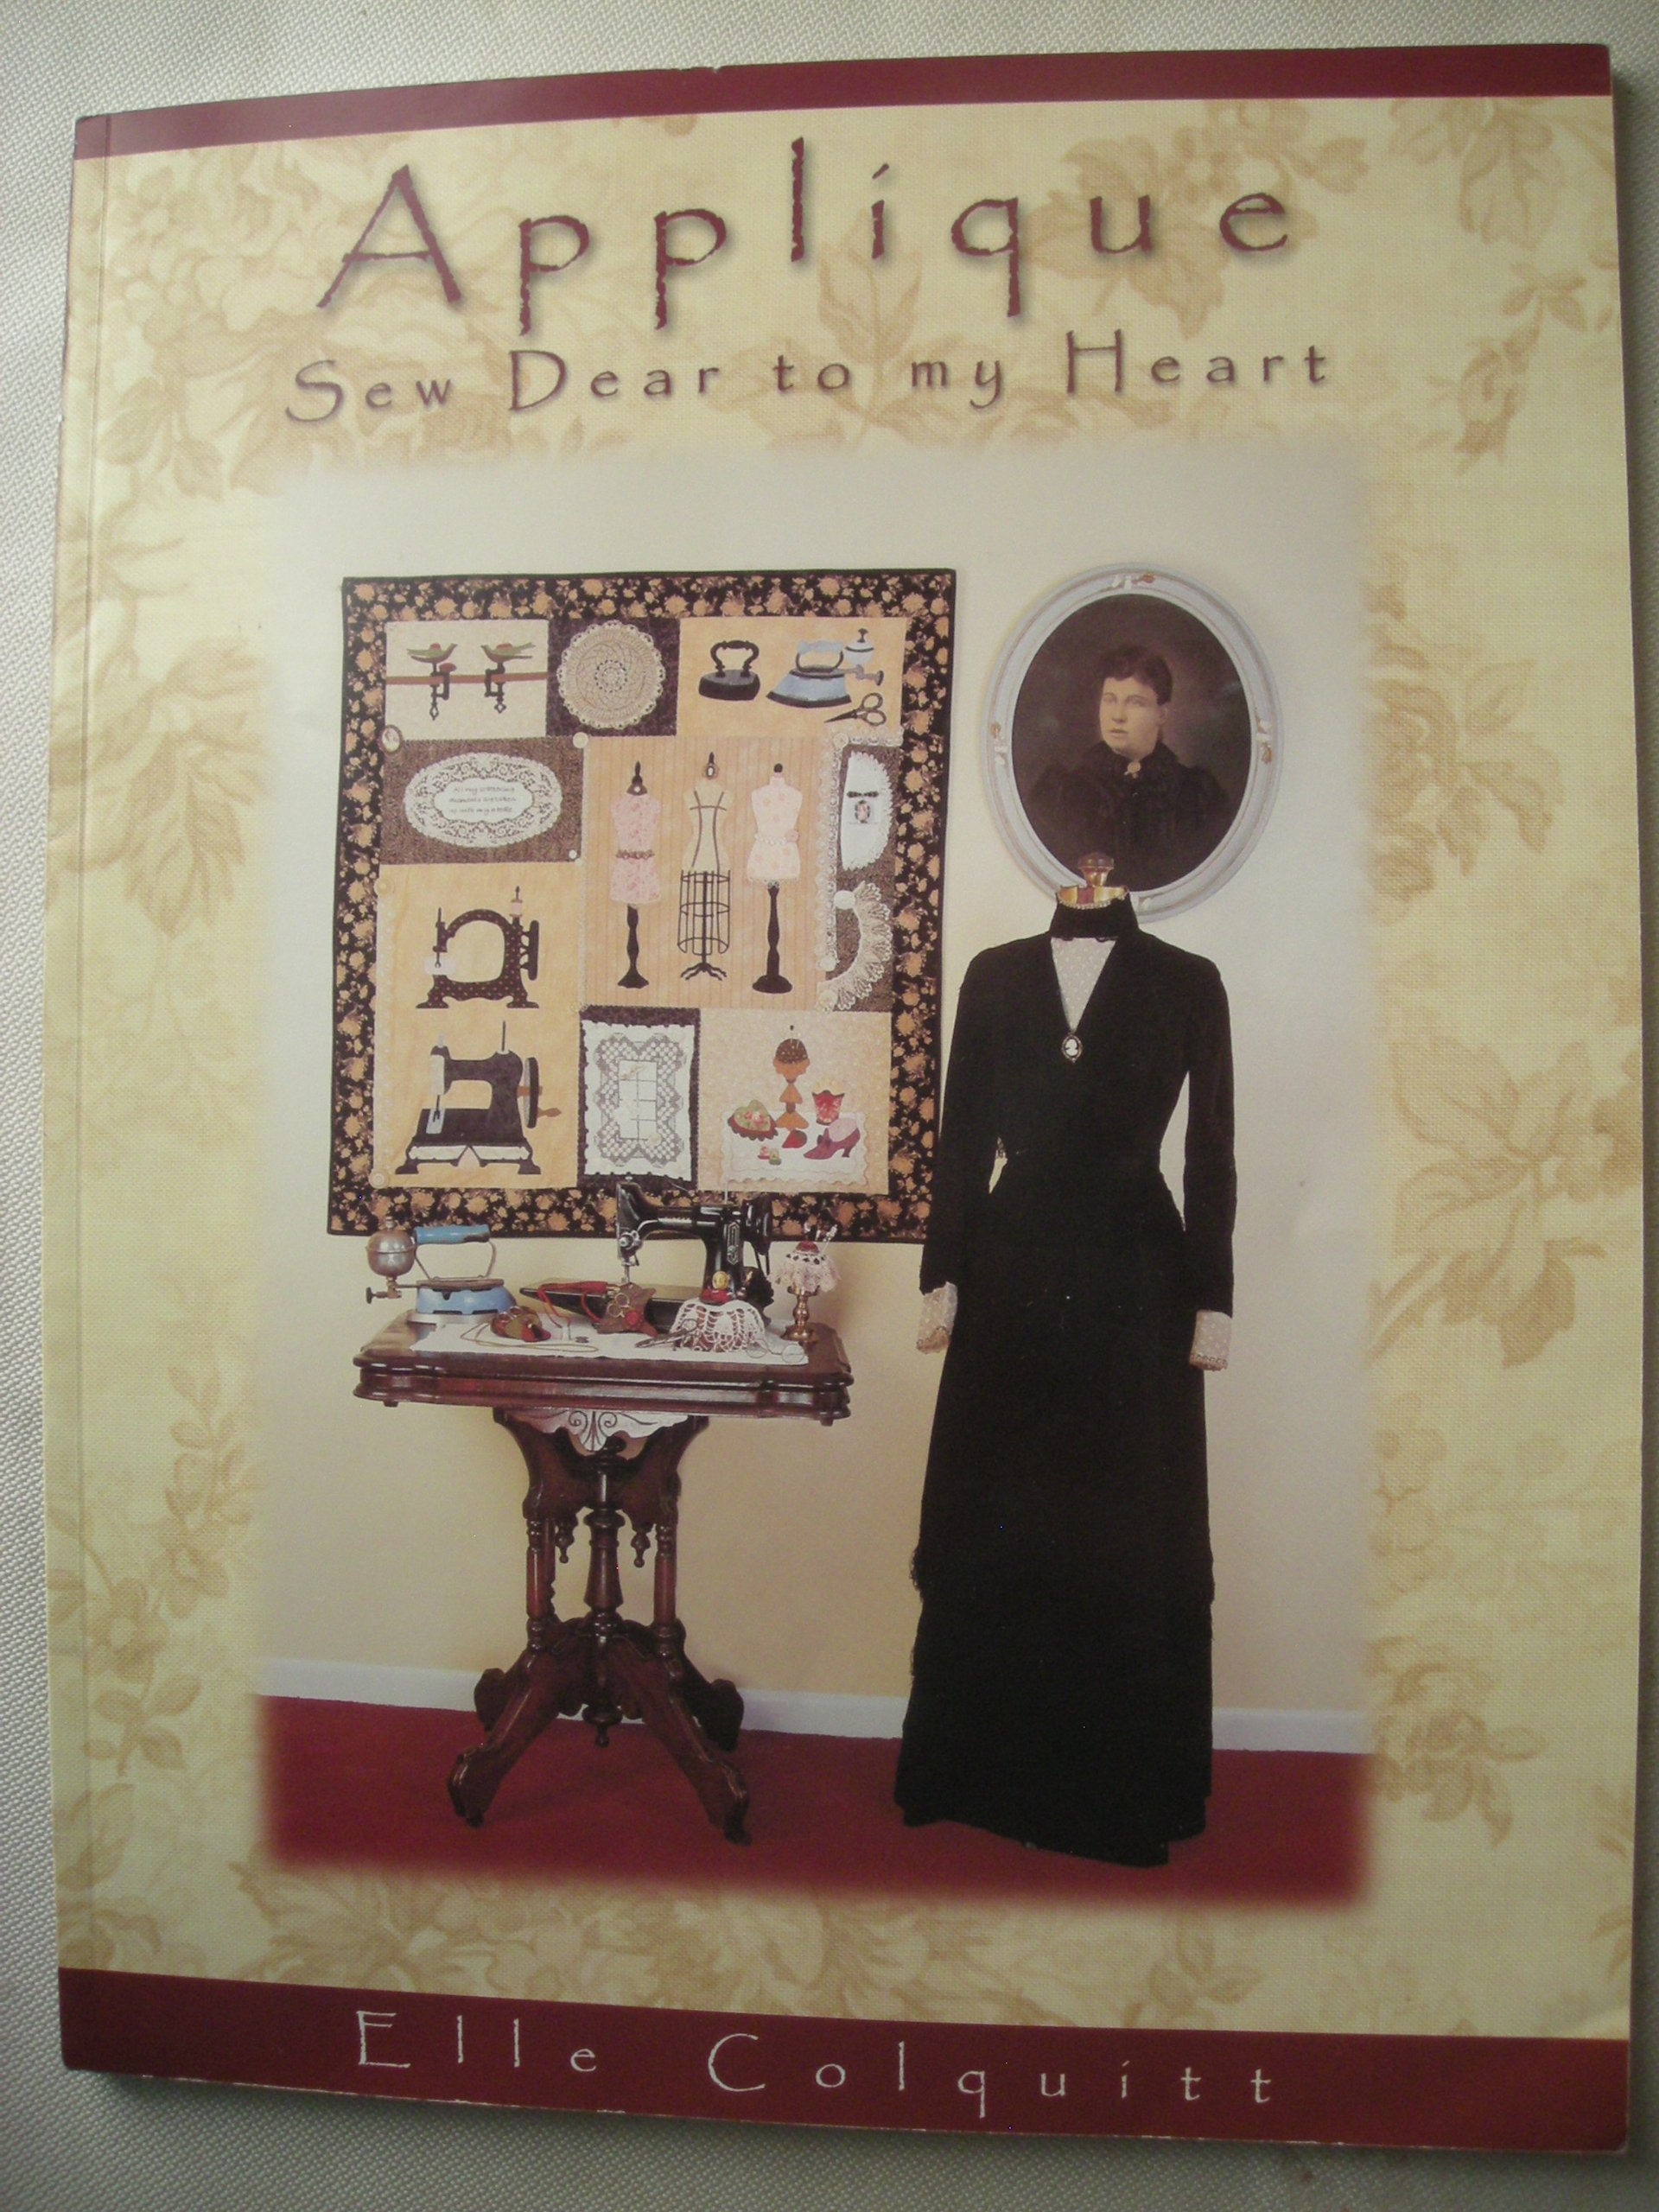 Applique: Sew Dear to my Heart